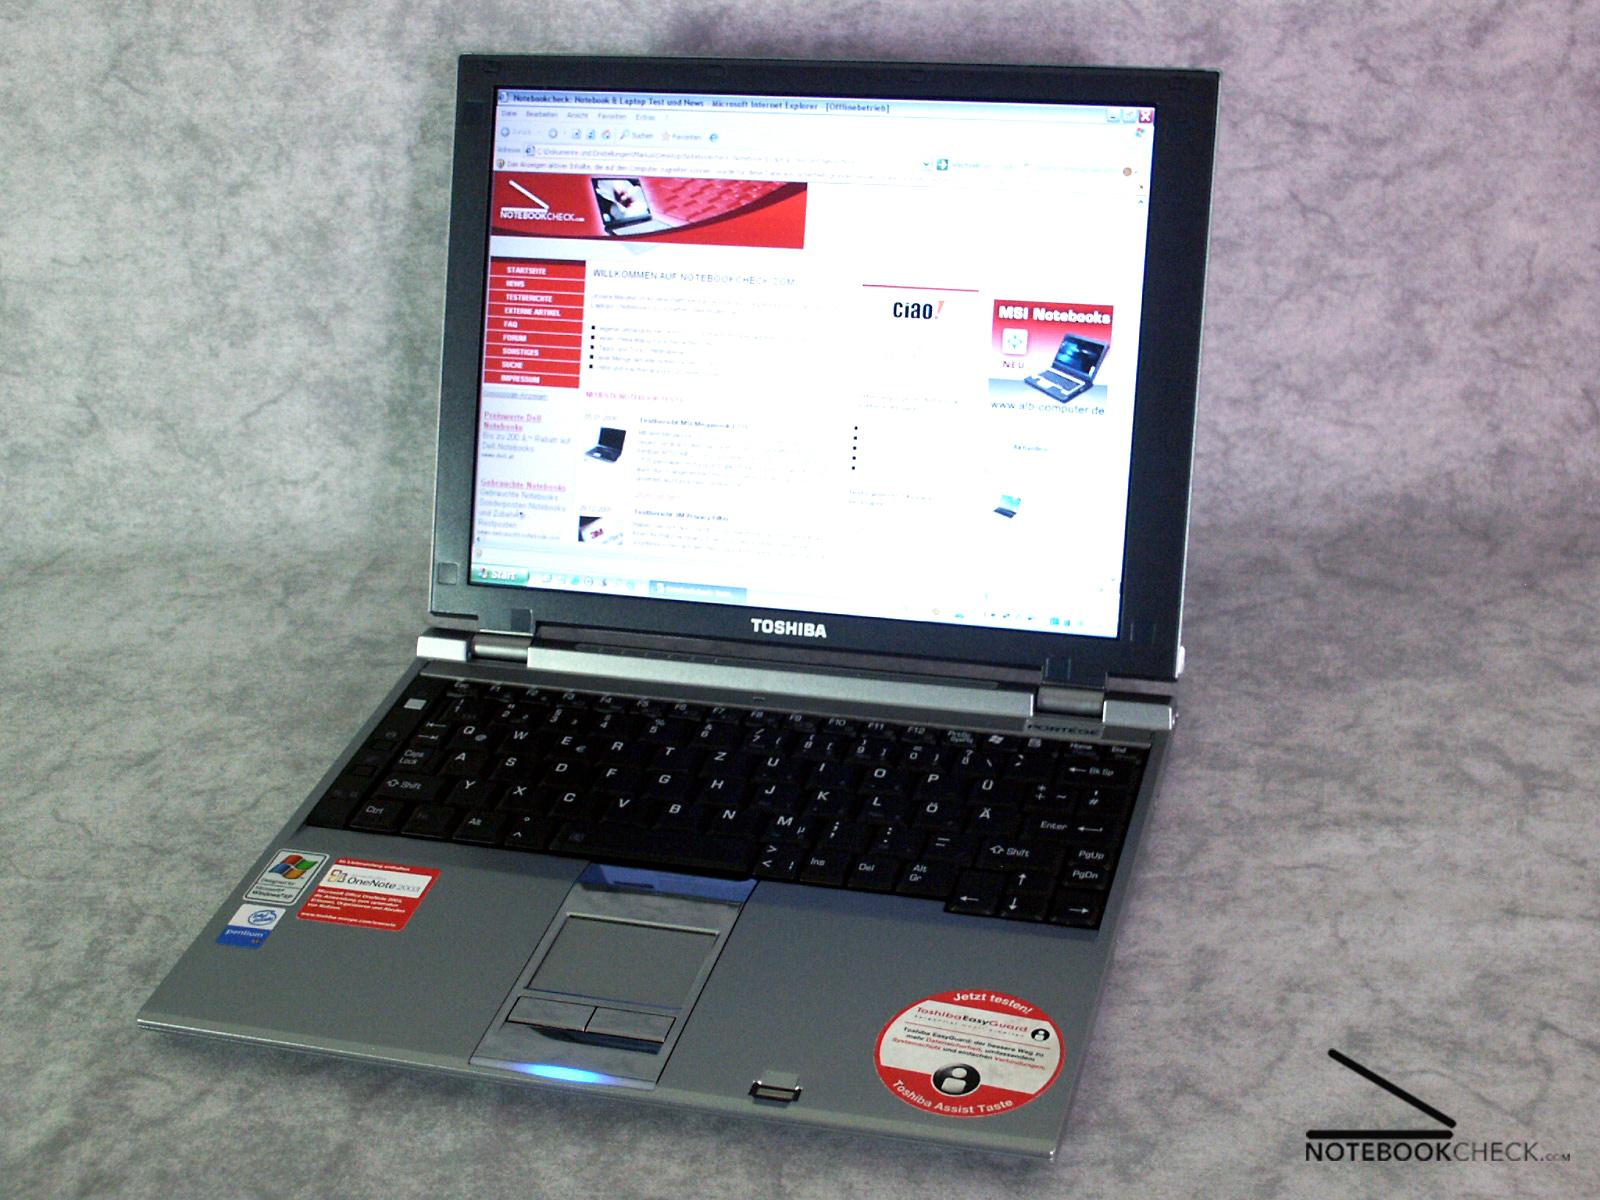 Toshiba Satellite Pro R200 Touchpad On/Off XP